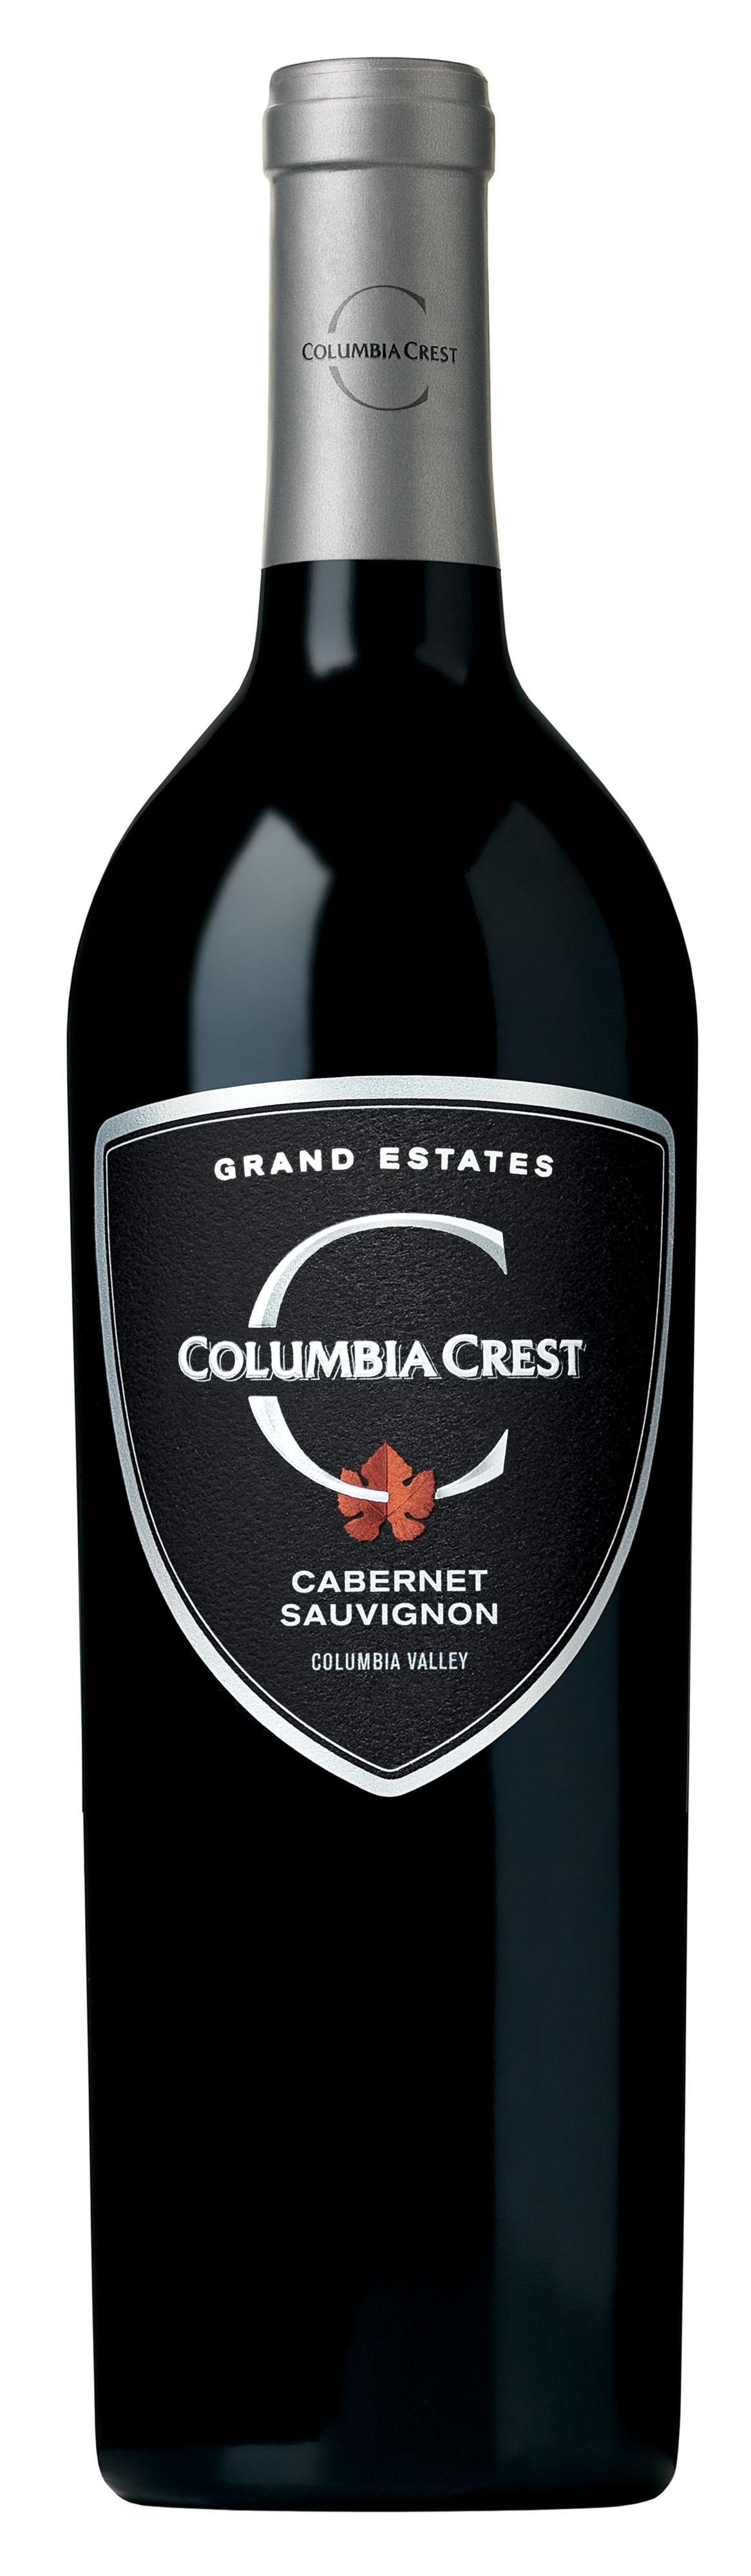 Caudalia Wine Box Julio 2017 EEUU Columbia Crest Cabernet Sauvignon